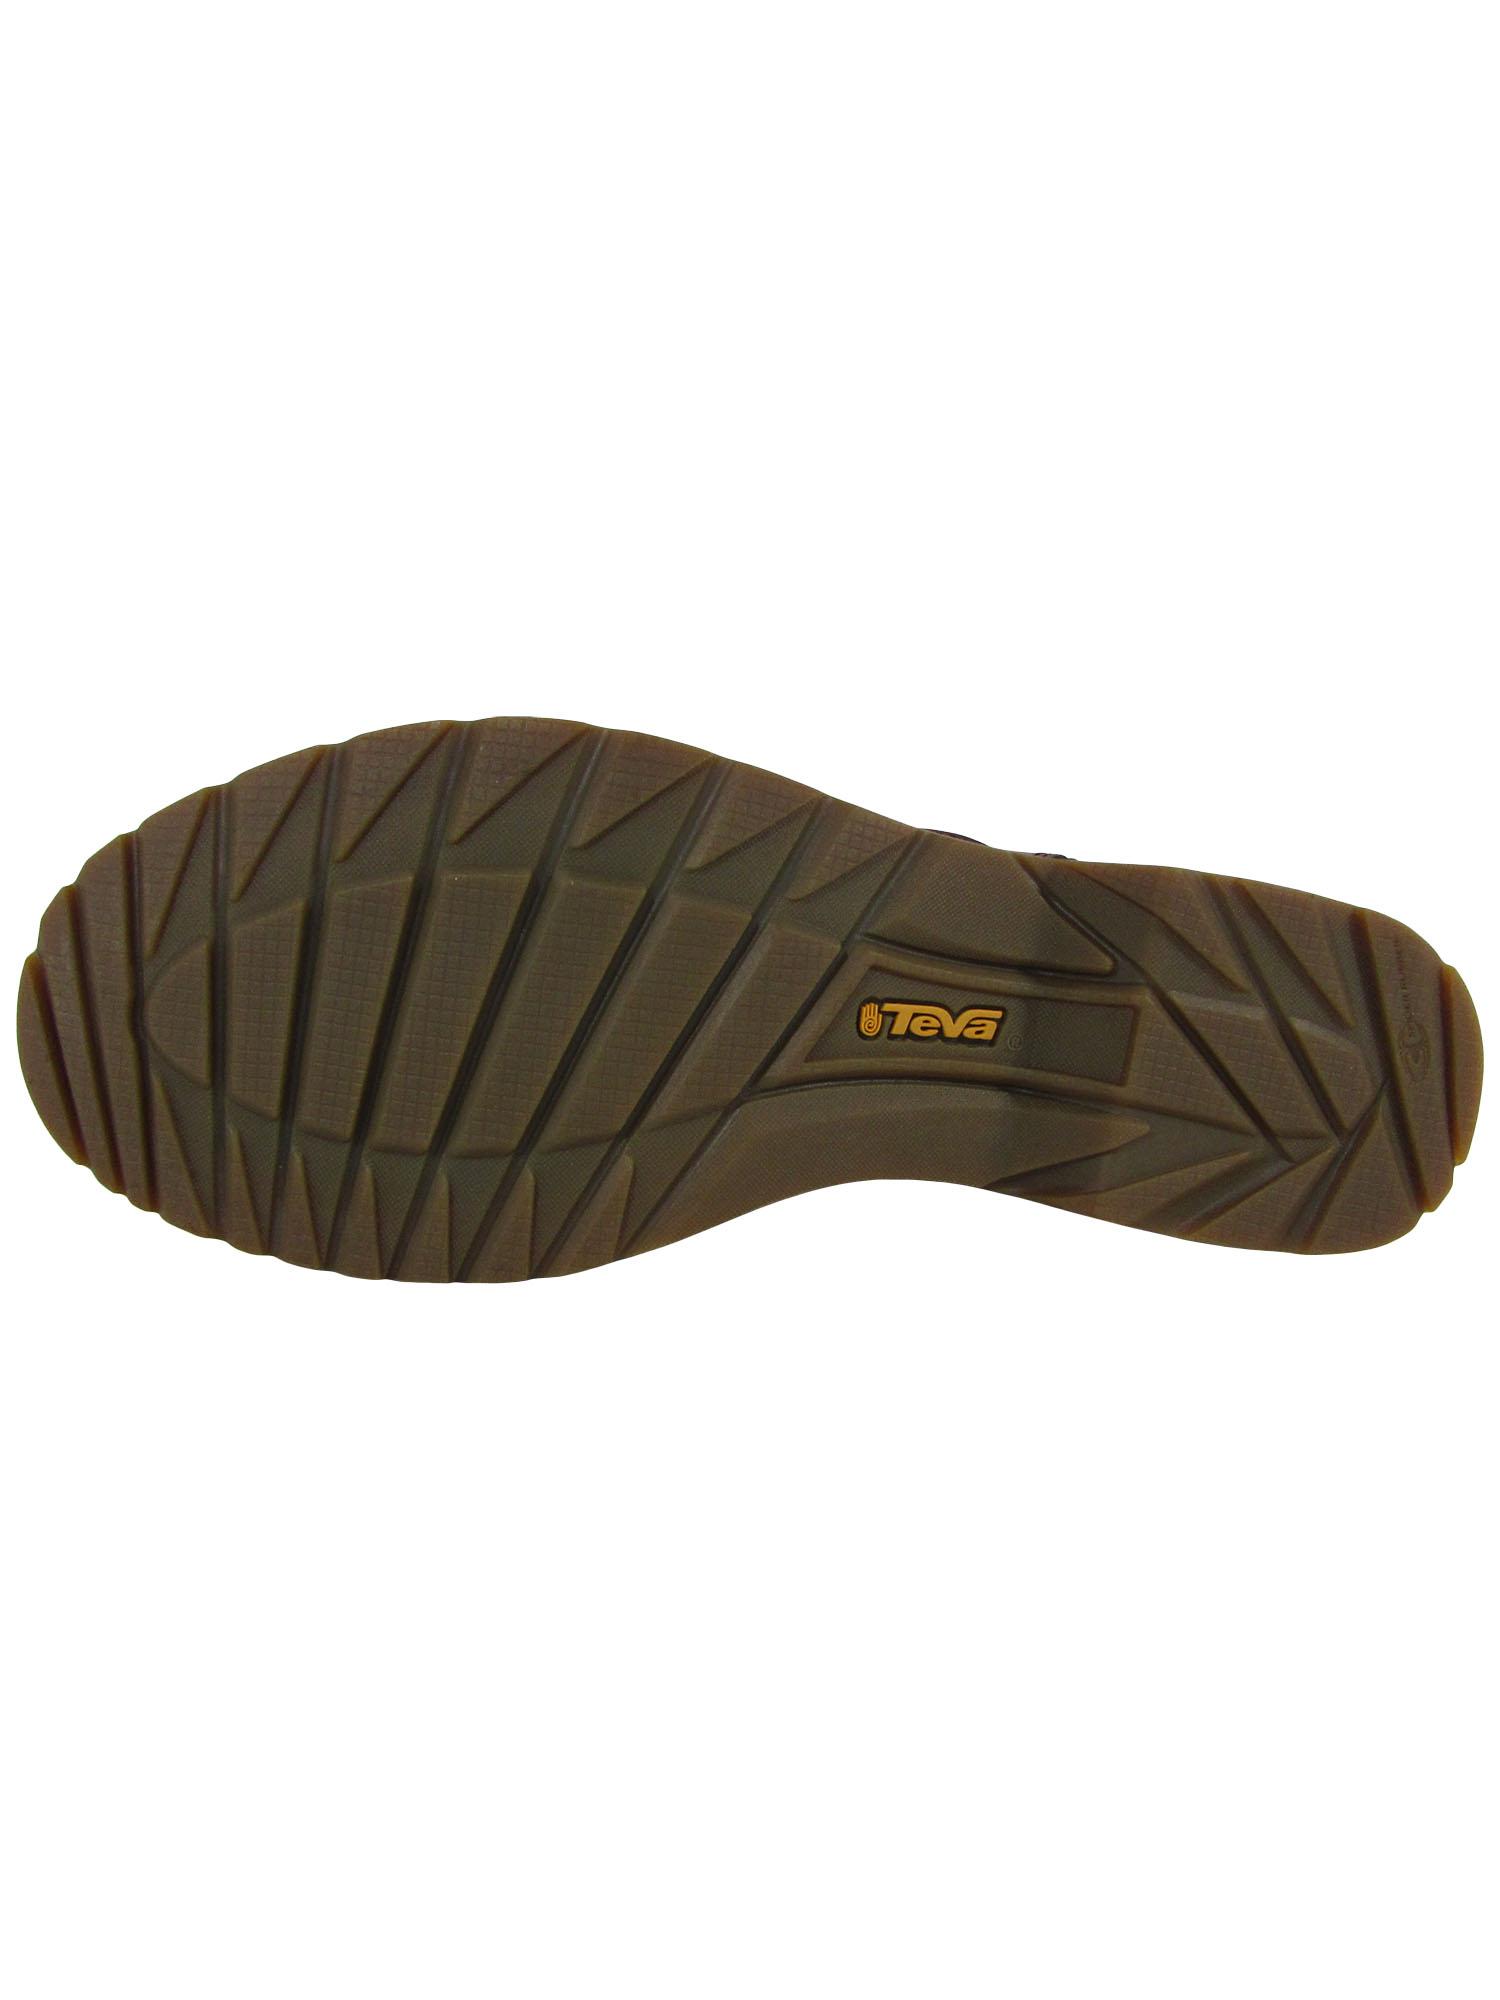 Teva Damenschuhe Boot Delavina Low Leder Fashion Boot Damenschuhe Schuhes 0621d5